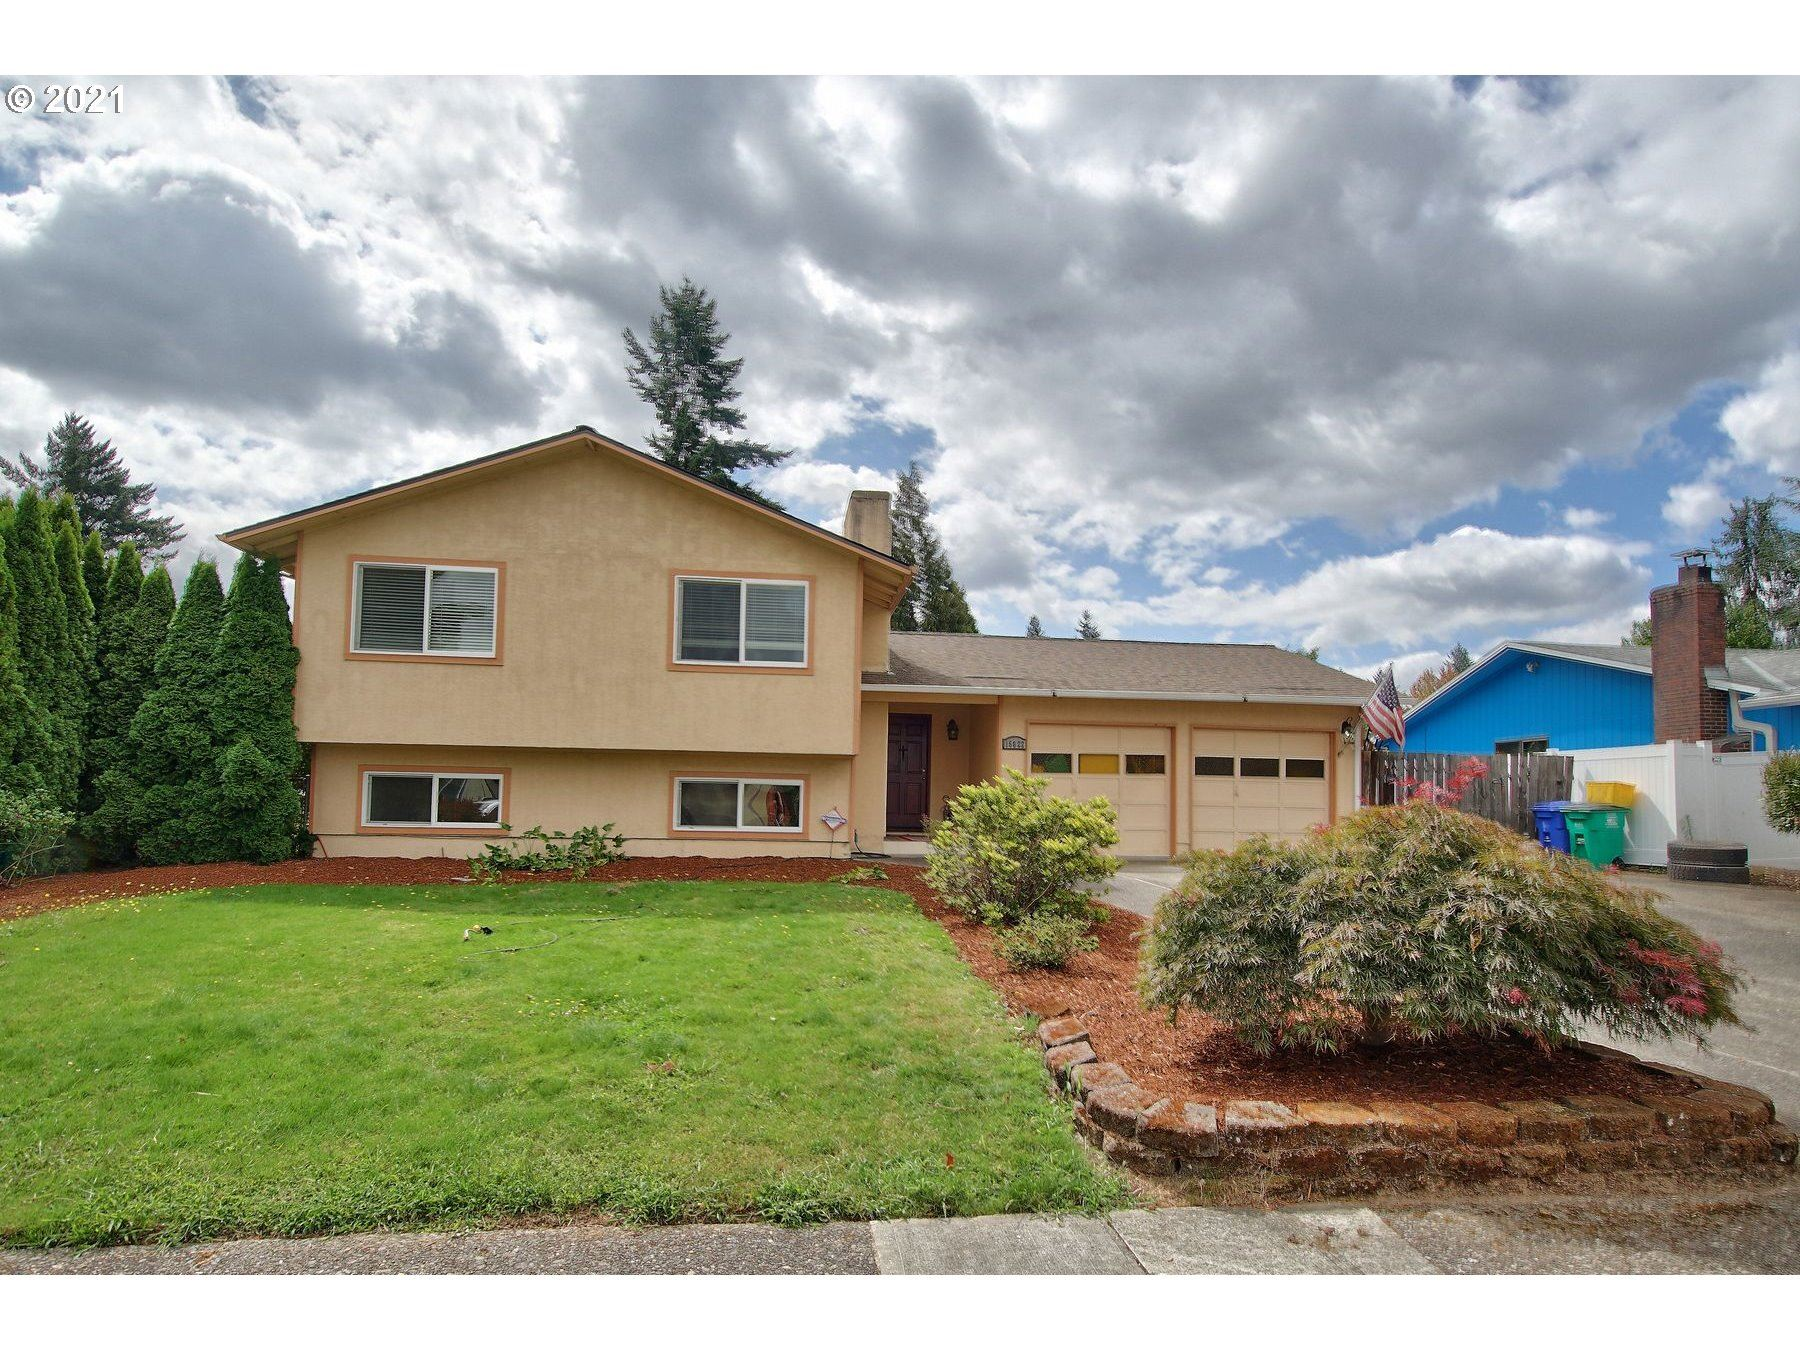 15822 NE SCHUYLER ST, Portland, OR 97230 - MLS#: 21552095